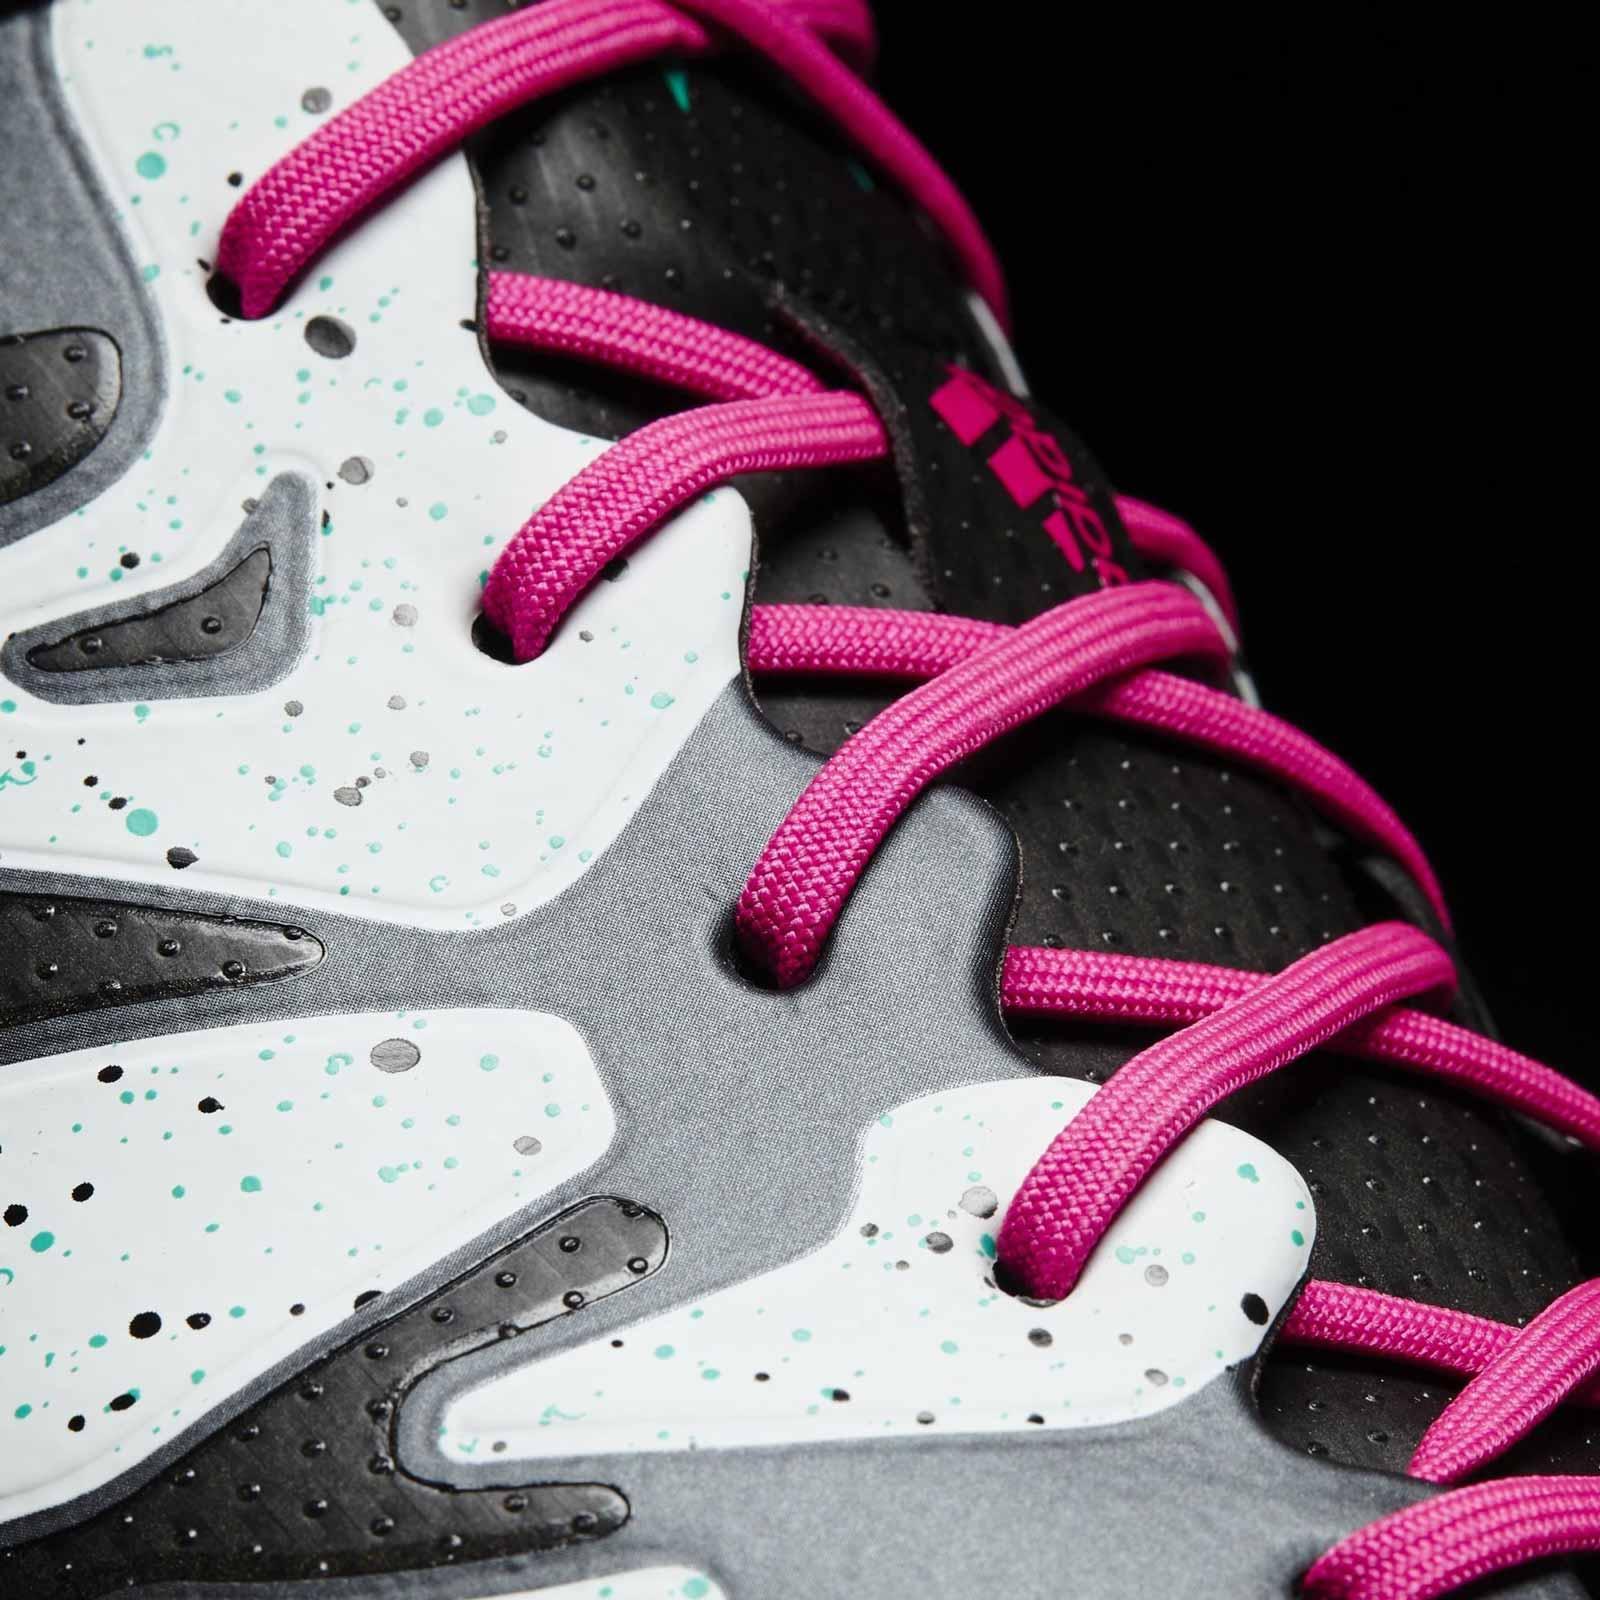 Adidas Sportschuhe 2015